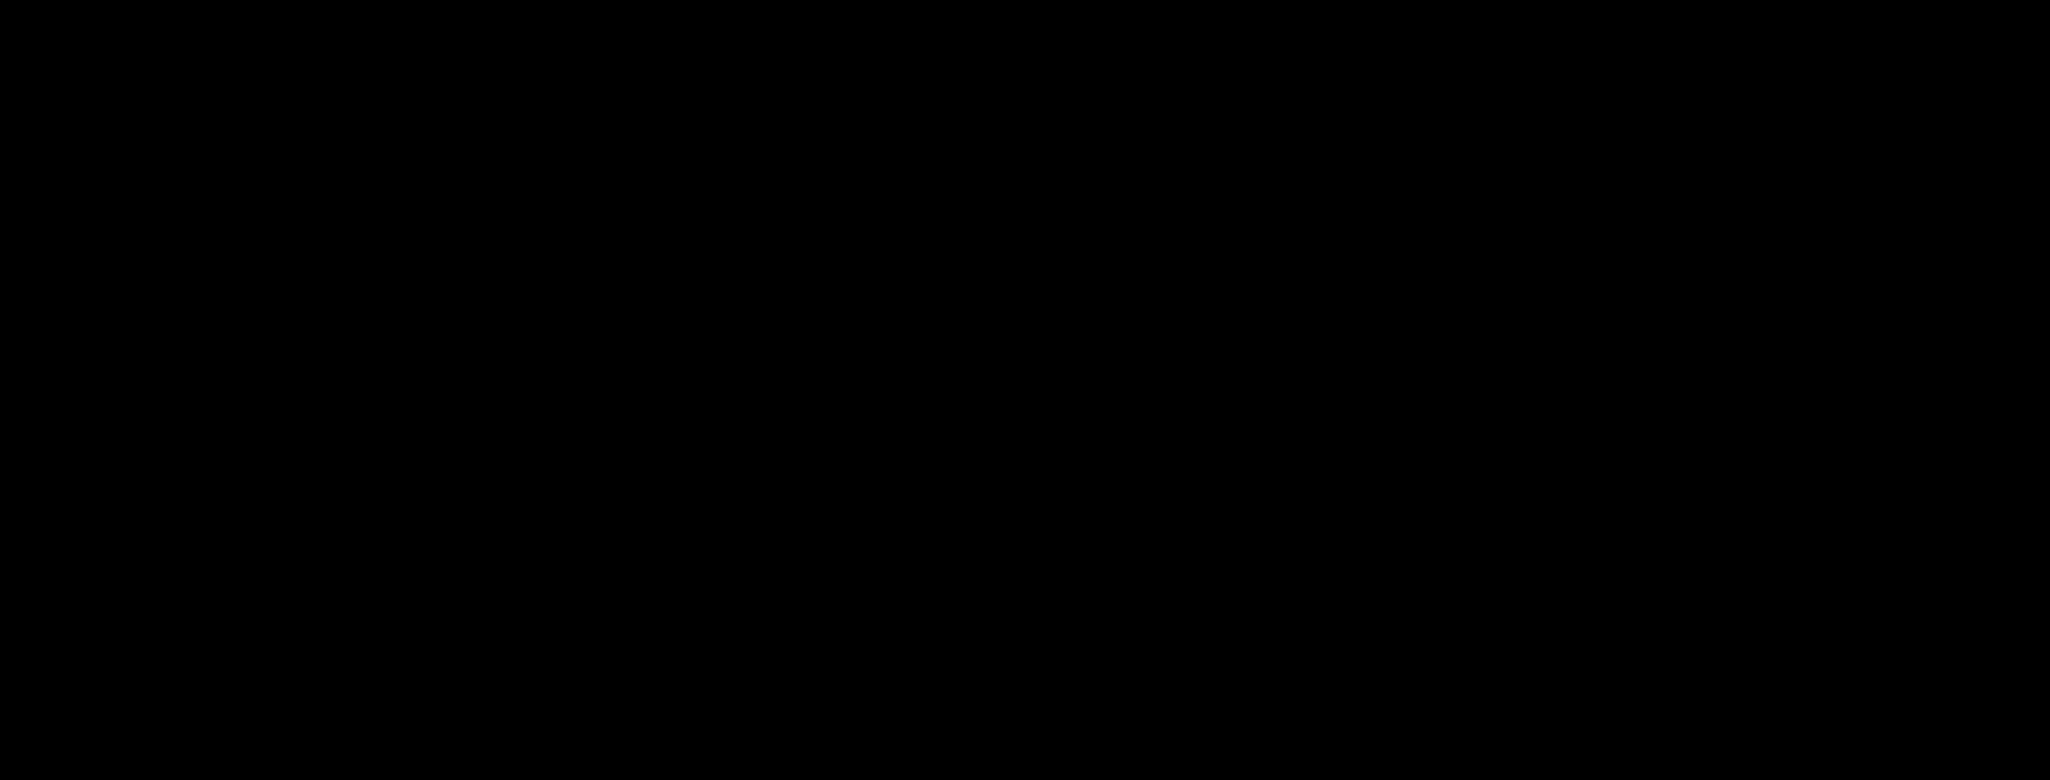 Copy of Copy of District Event Venue - Logo.png